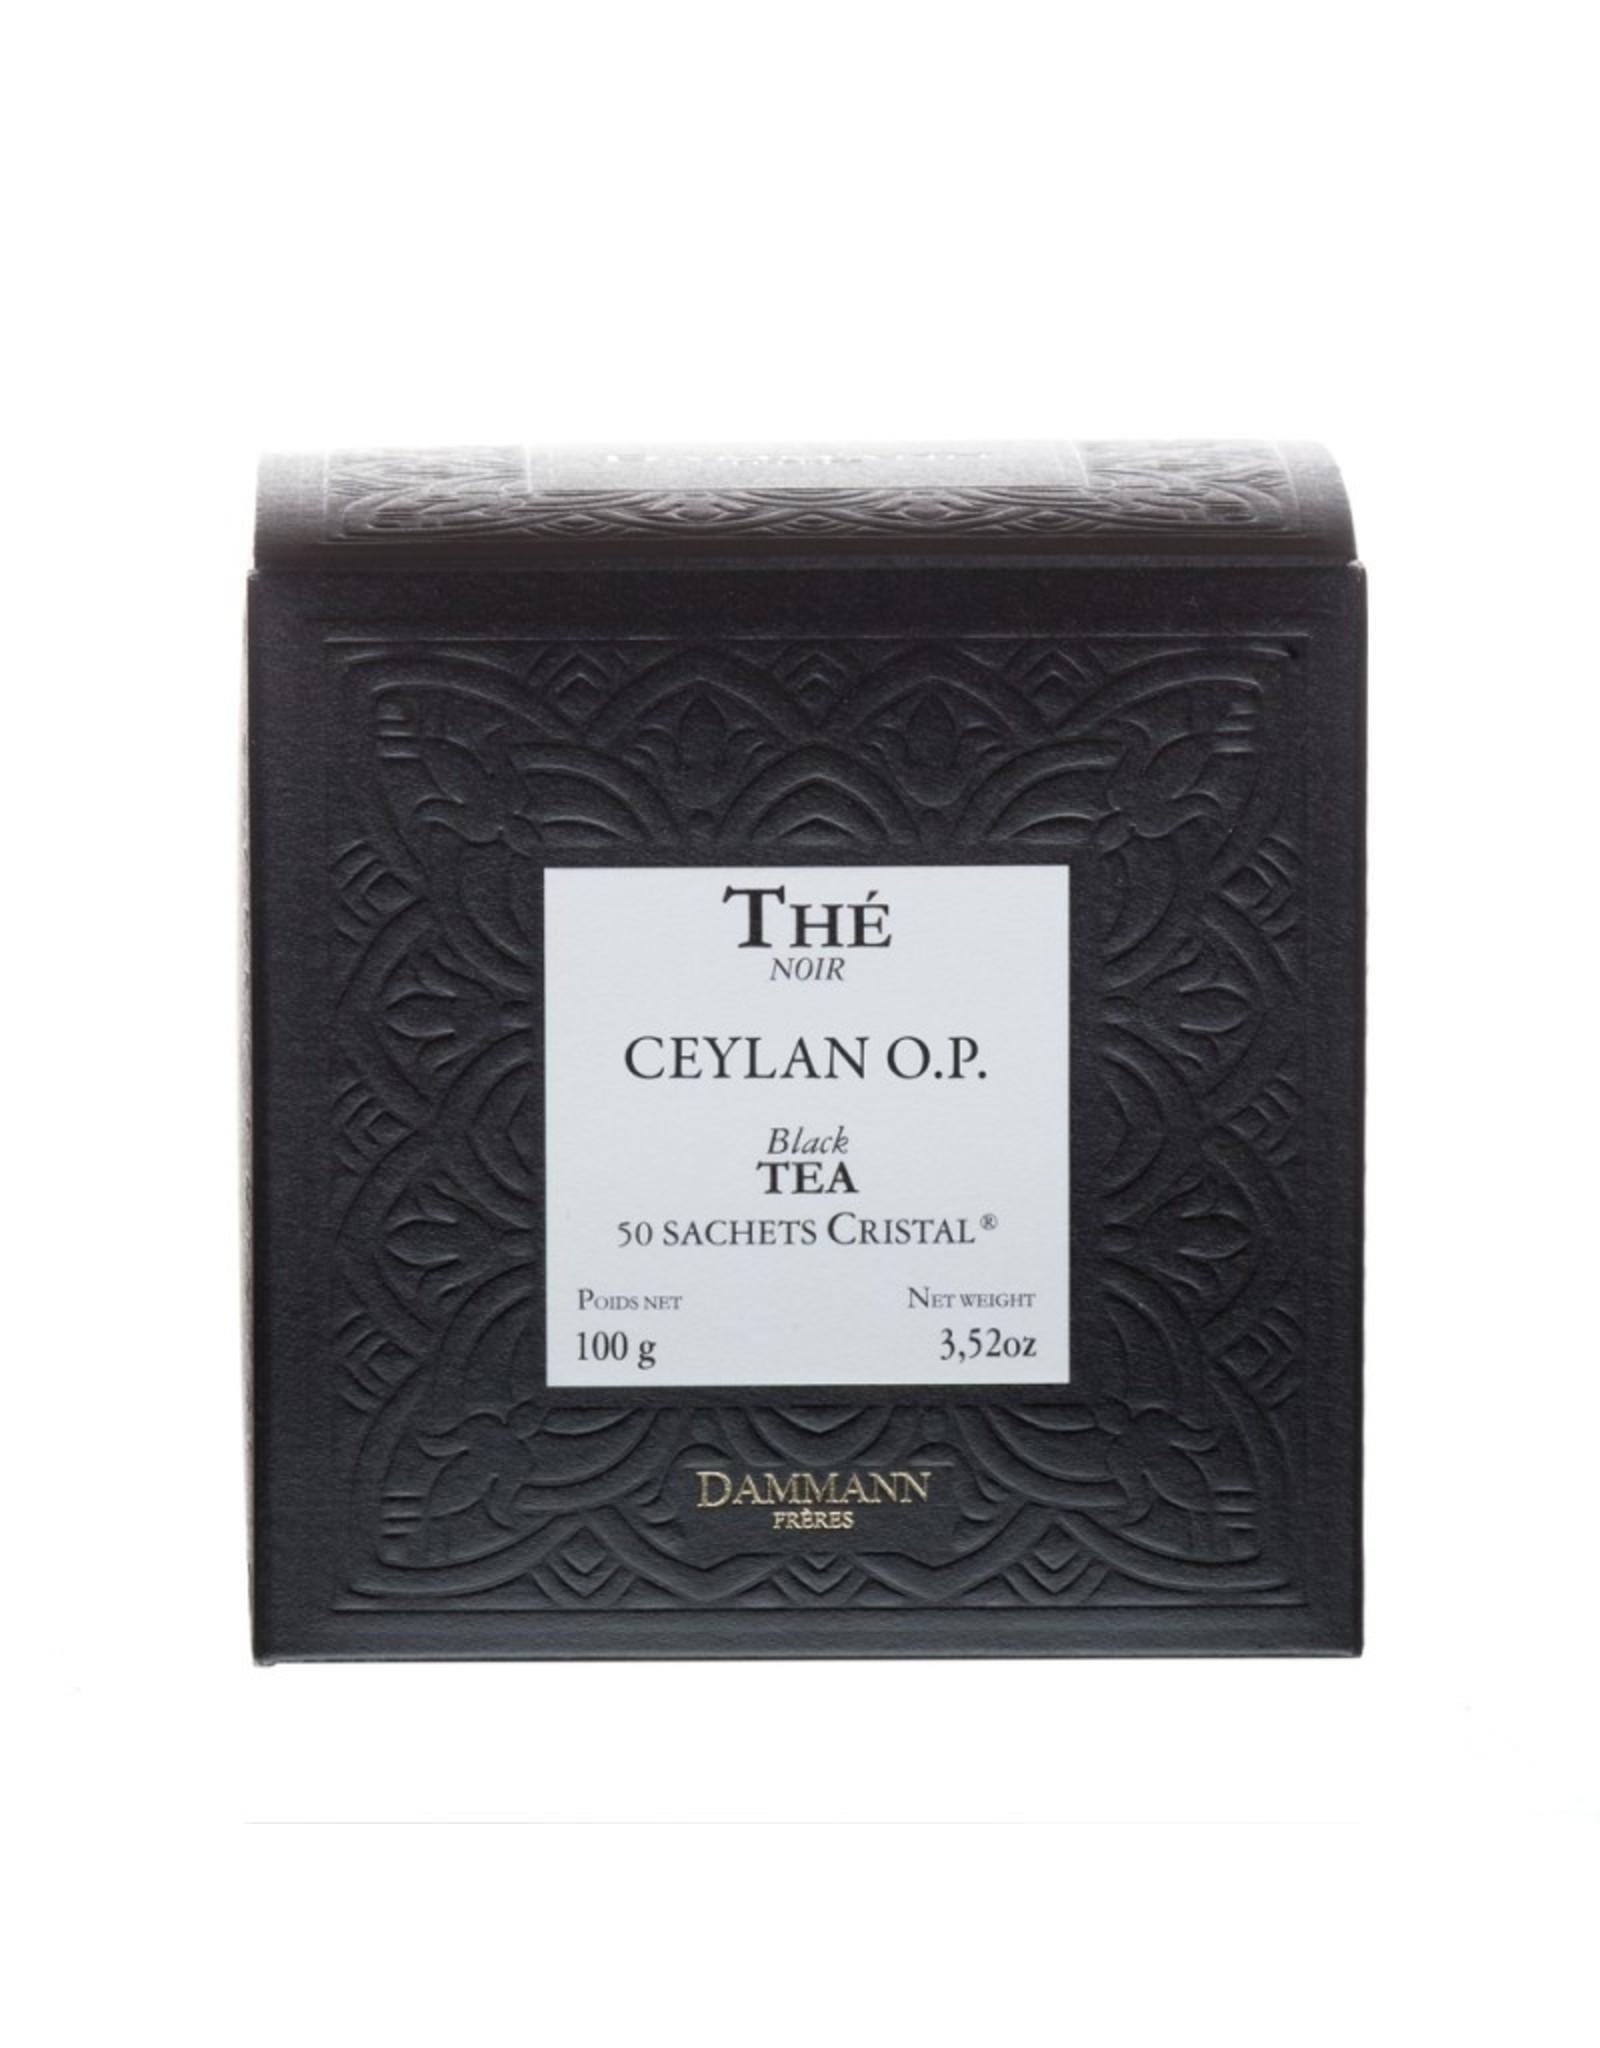 Dammann 'Ceylan O.P' Black tea